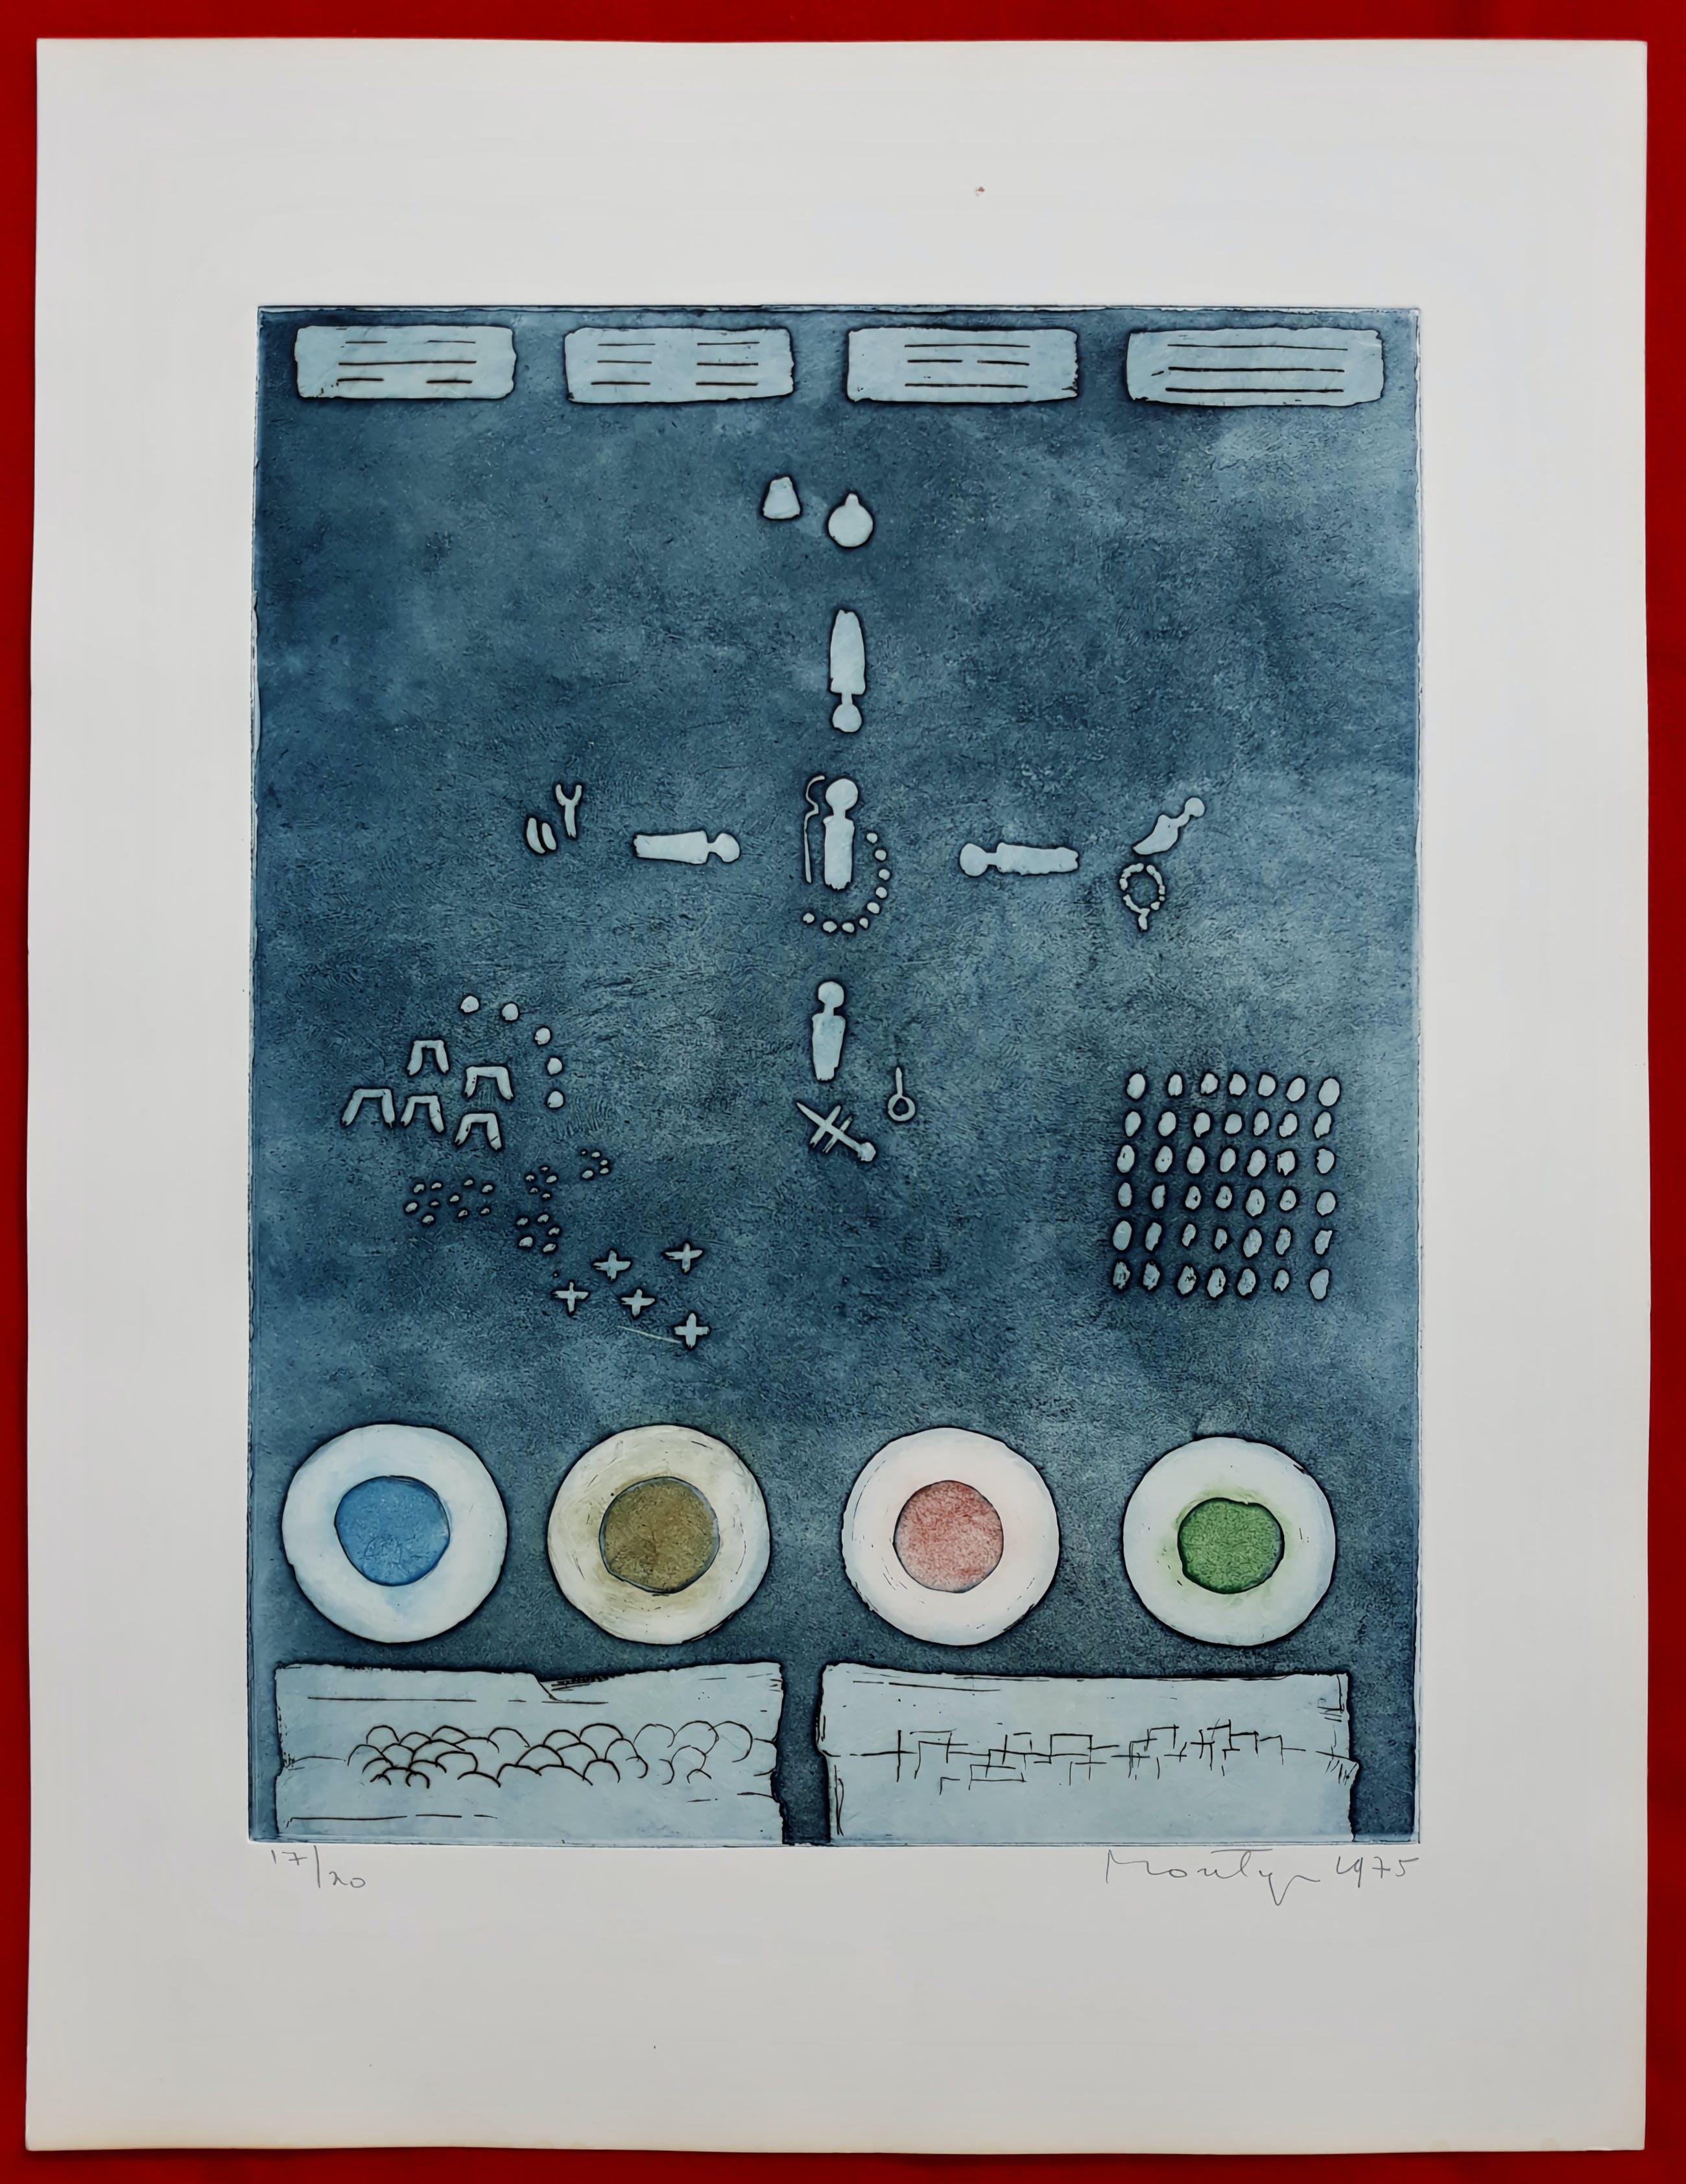 Jan Montyn - Chonyid Bardo - Non formation de pense, aquatint ets (kleine oplage) kopen? Bied vanaf 115!